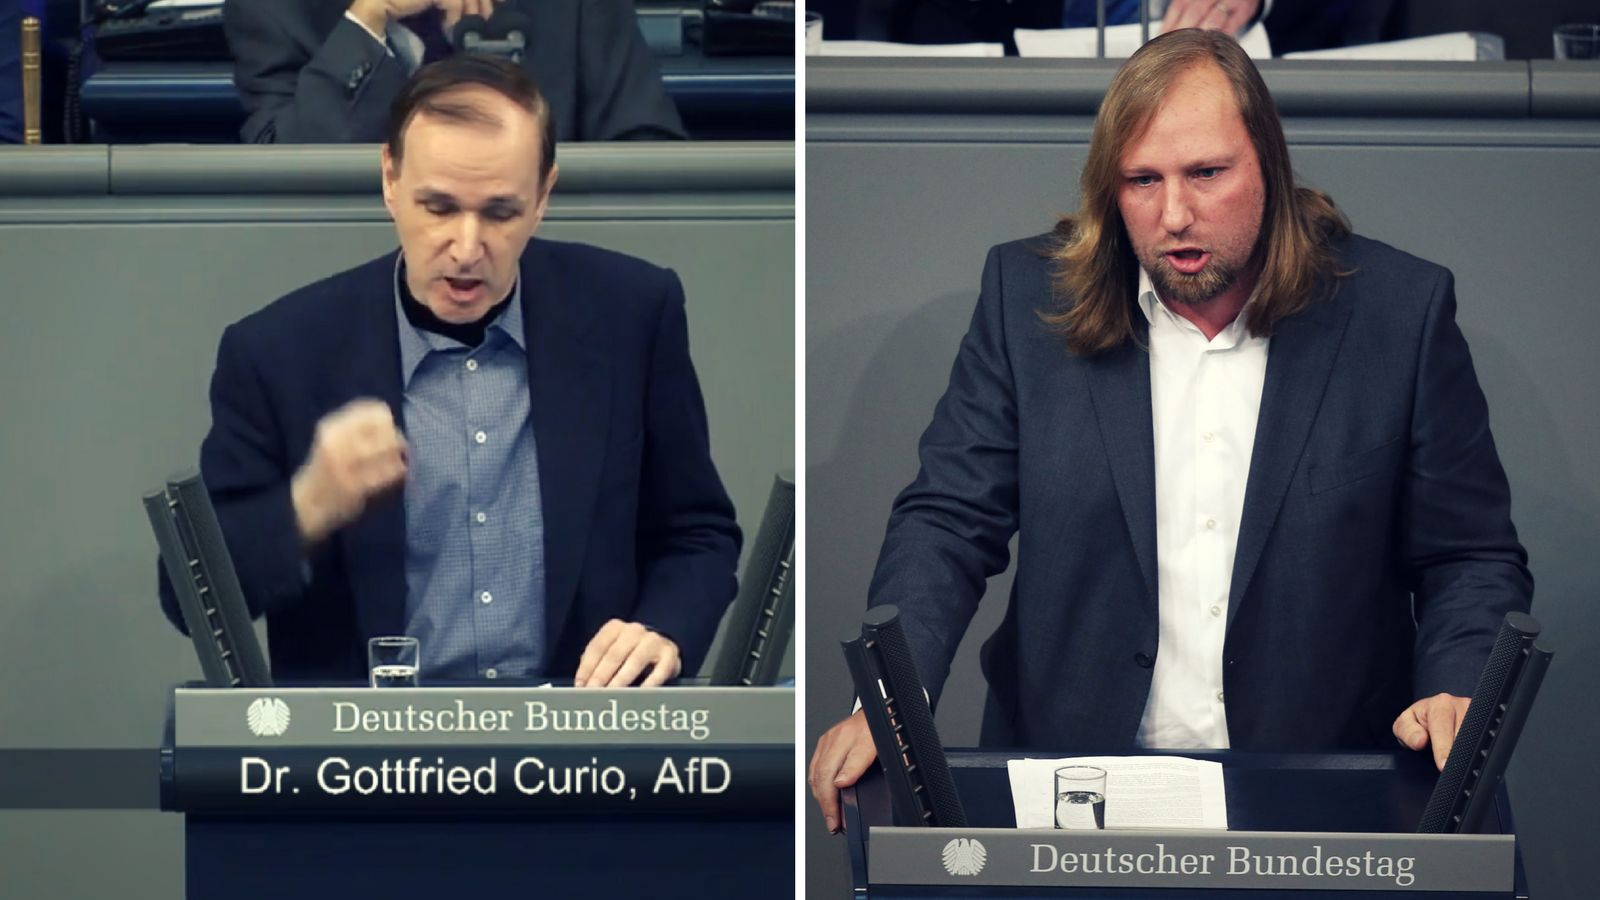 Wutduell im Bundestag: AfD-Mann hält Hetzrede – dann dreht Toni Hofreiter